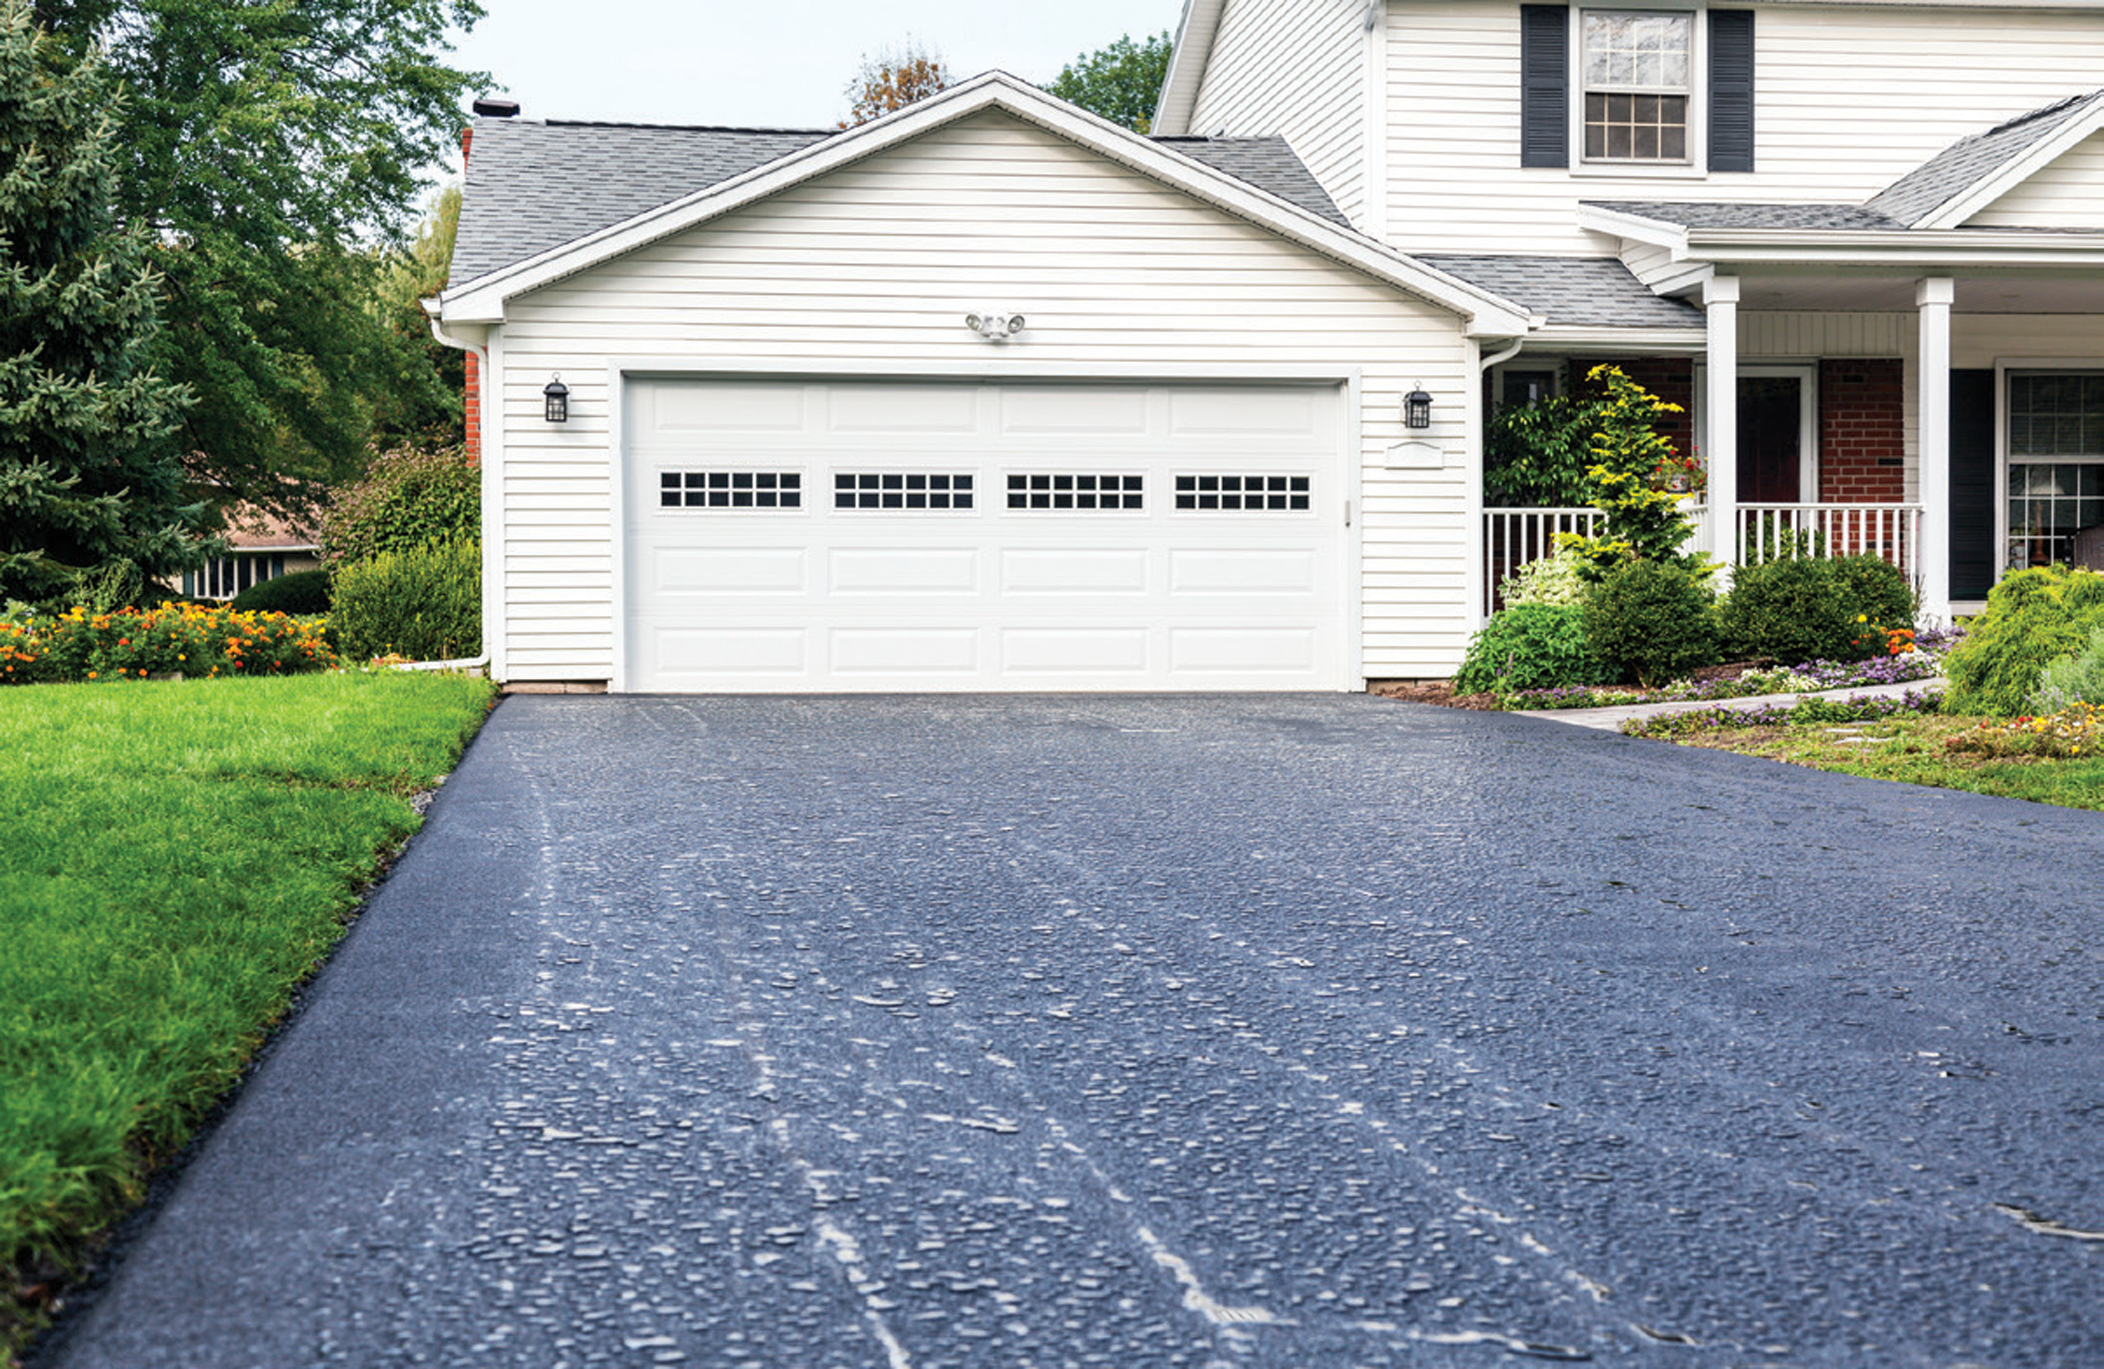 New Asphalt Driveway Rain Puddles at Residential Home